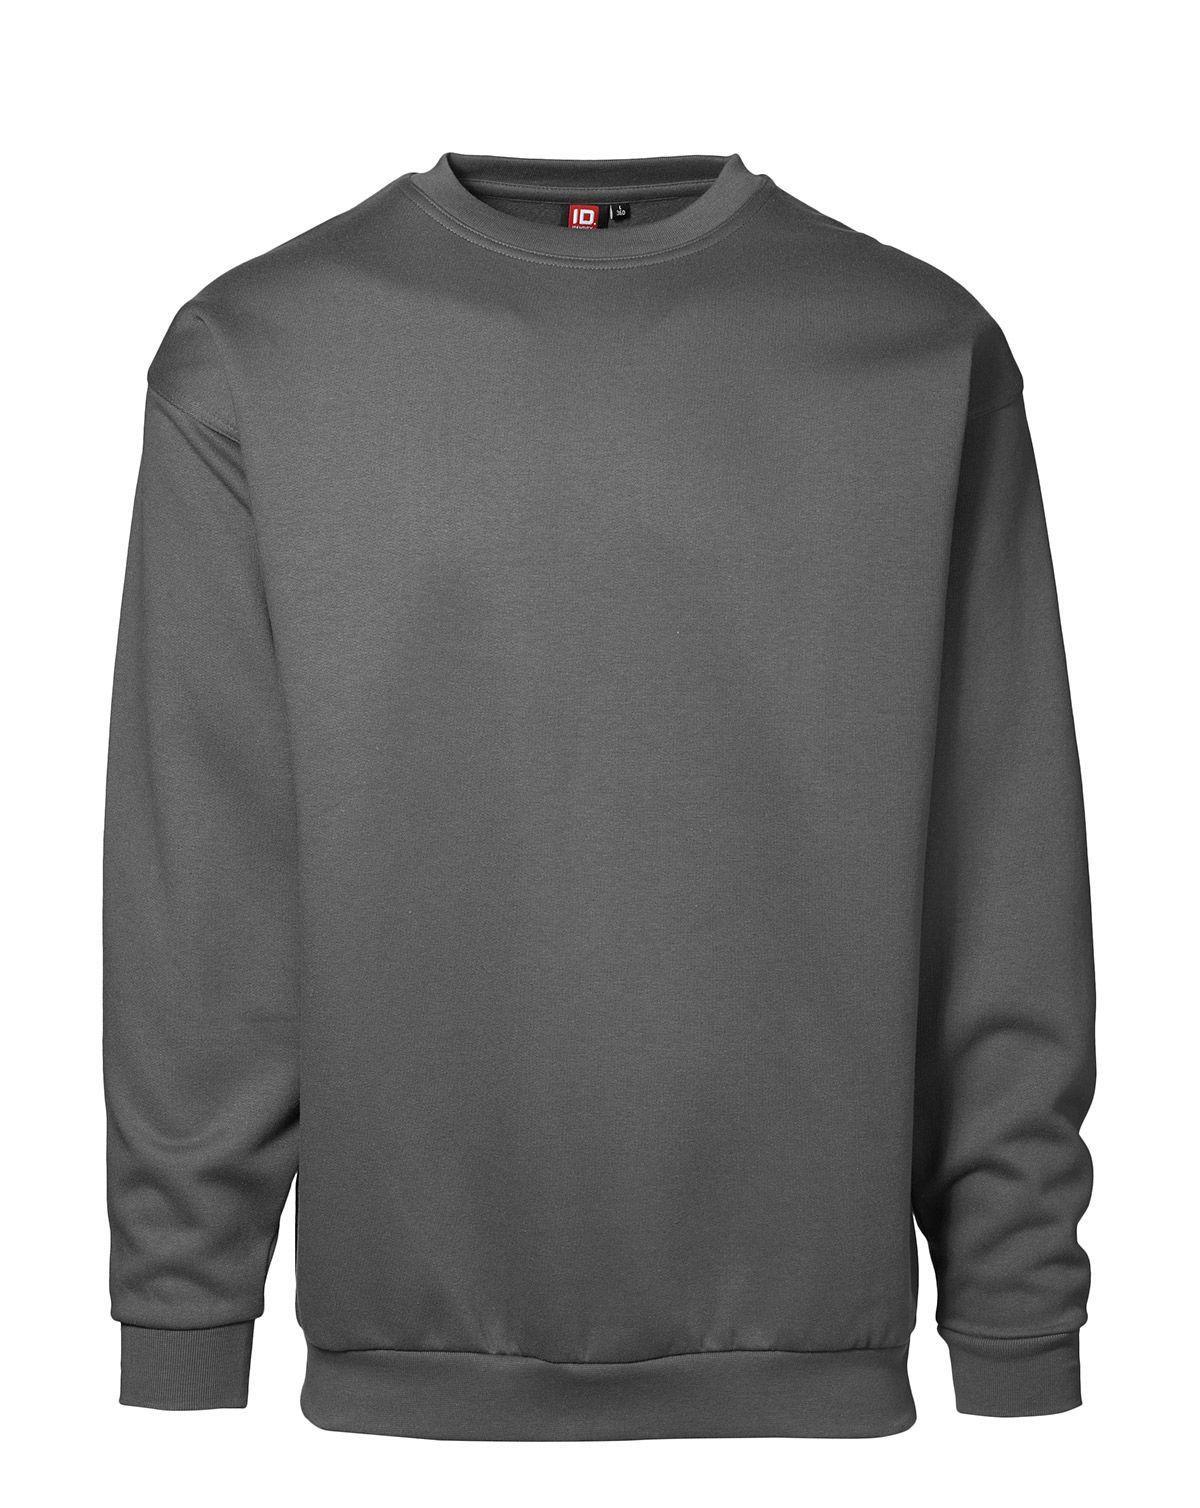 Billede af ID PRO Wear Sweatshirt (Sølv Grå, XS)